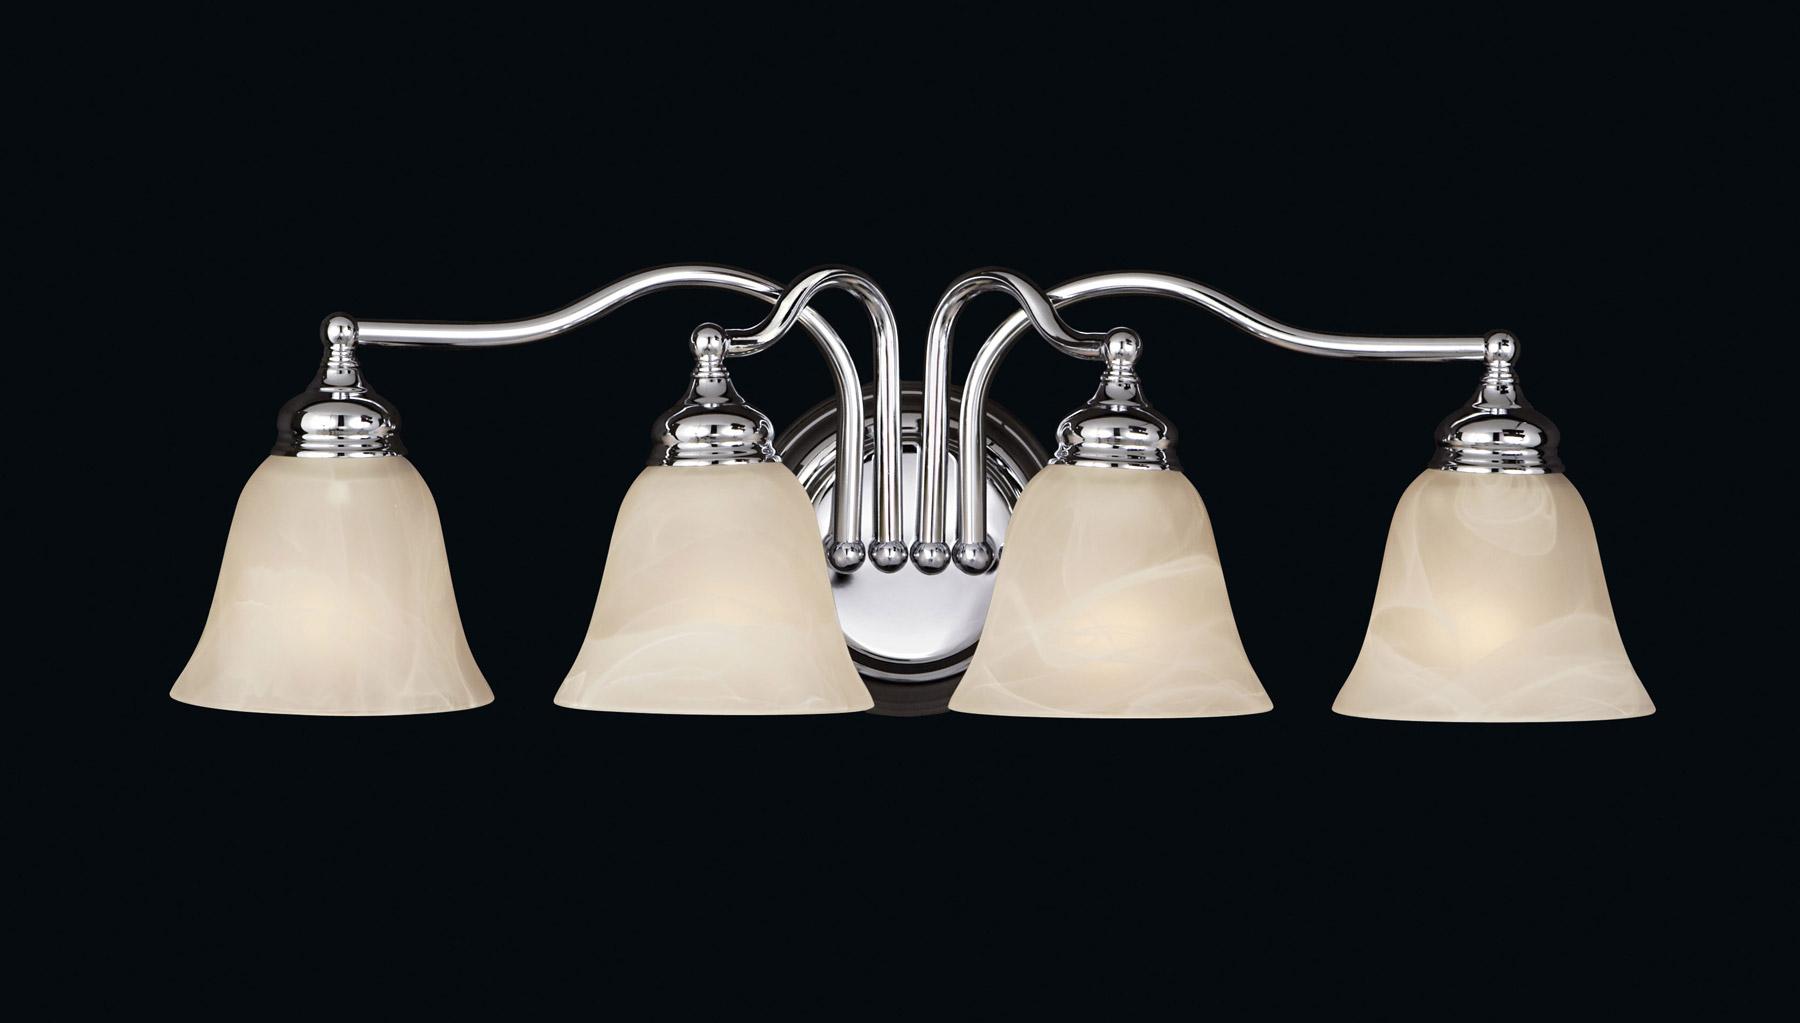 Murray feiss vs6704 ch bristol vanity light aloadofball Images